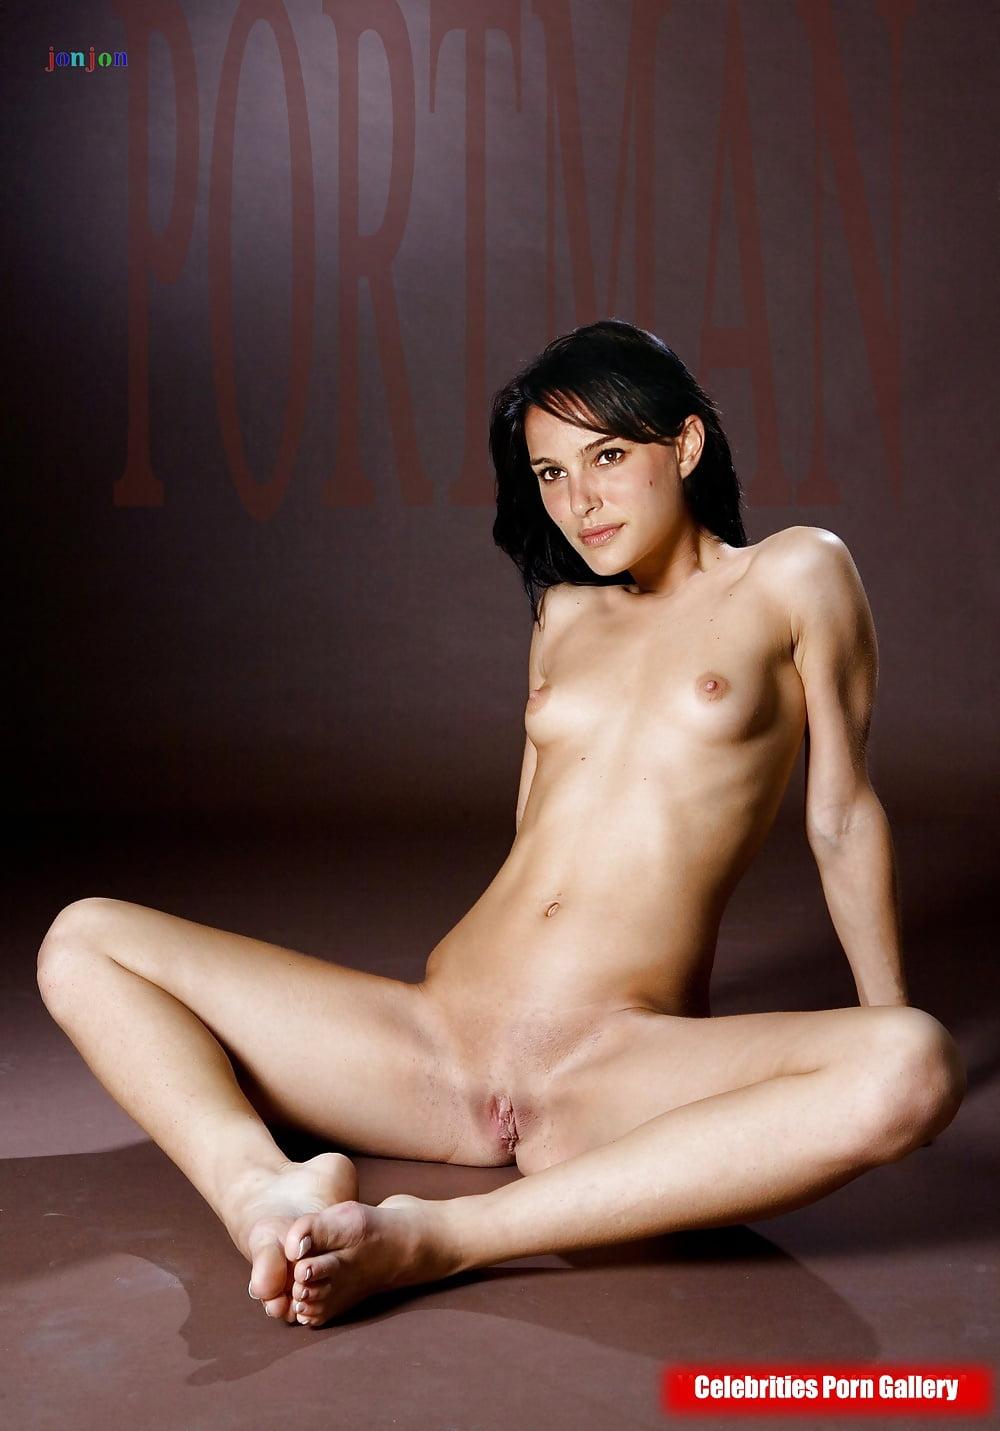 Naked Natalie Zea Fakes Nude Photos